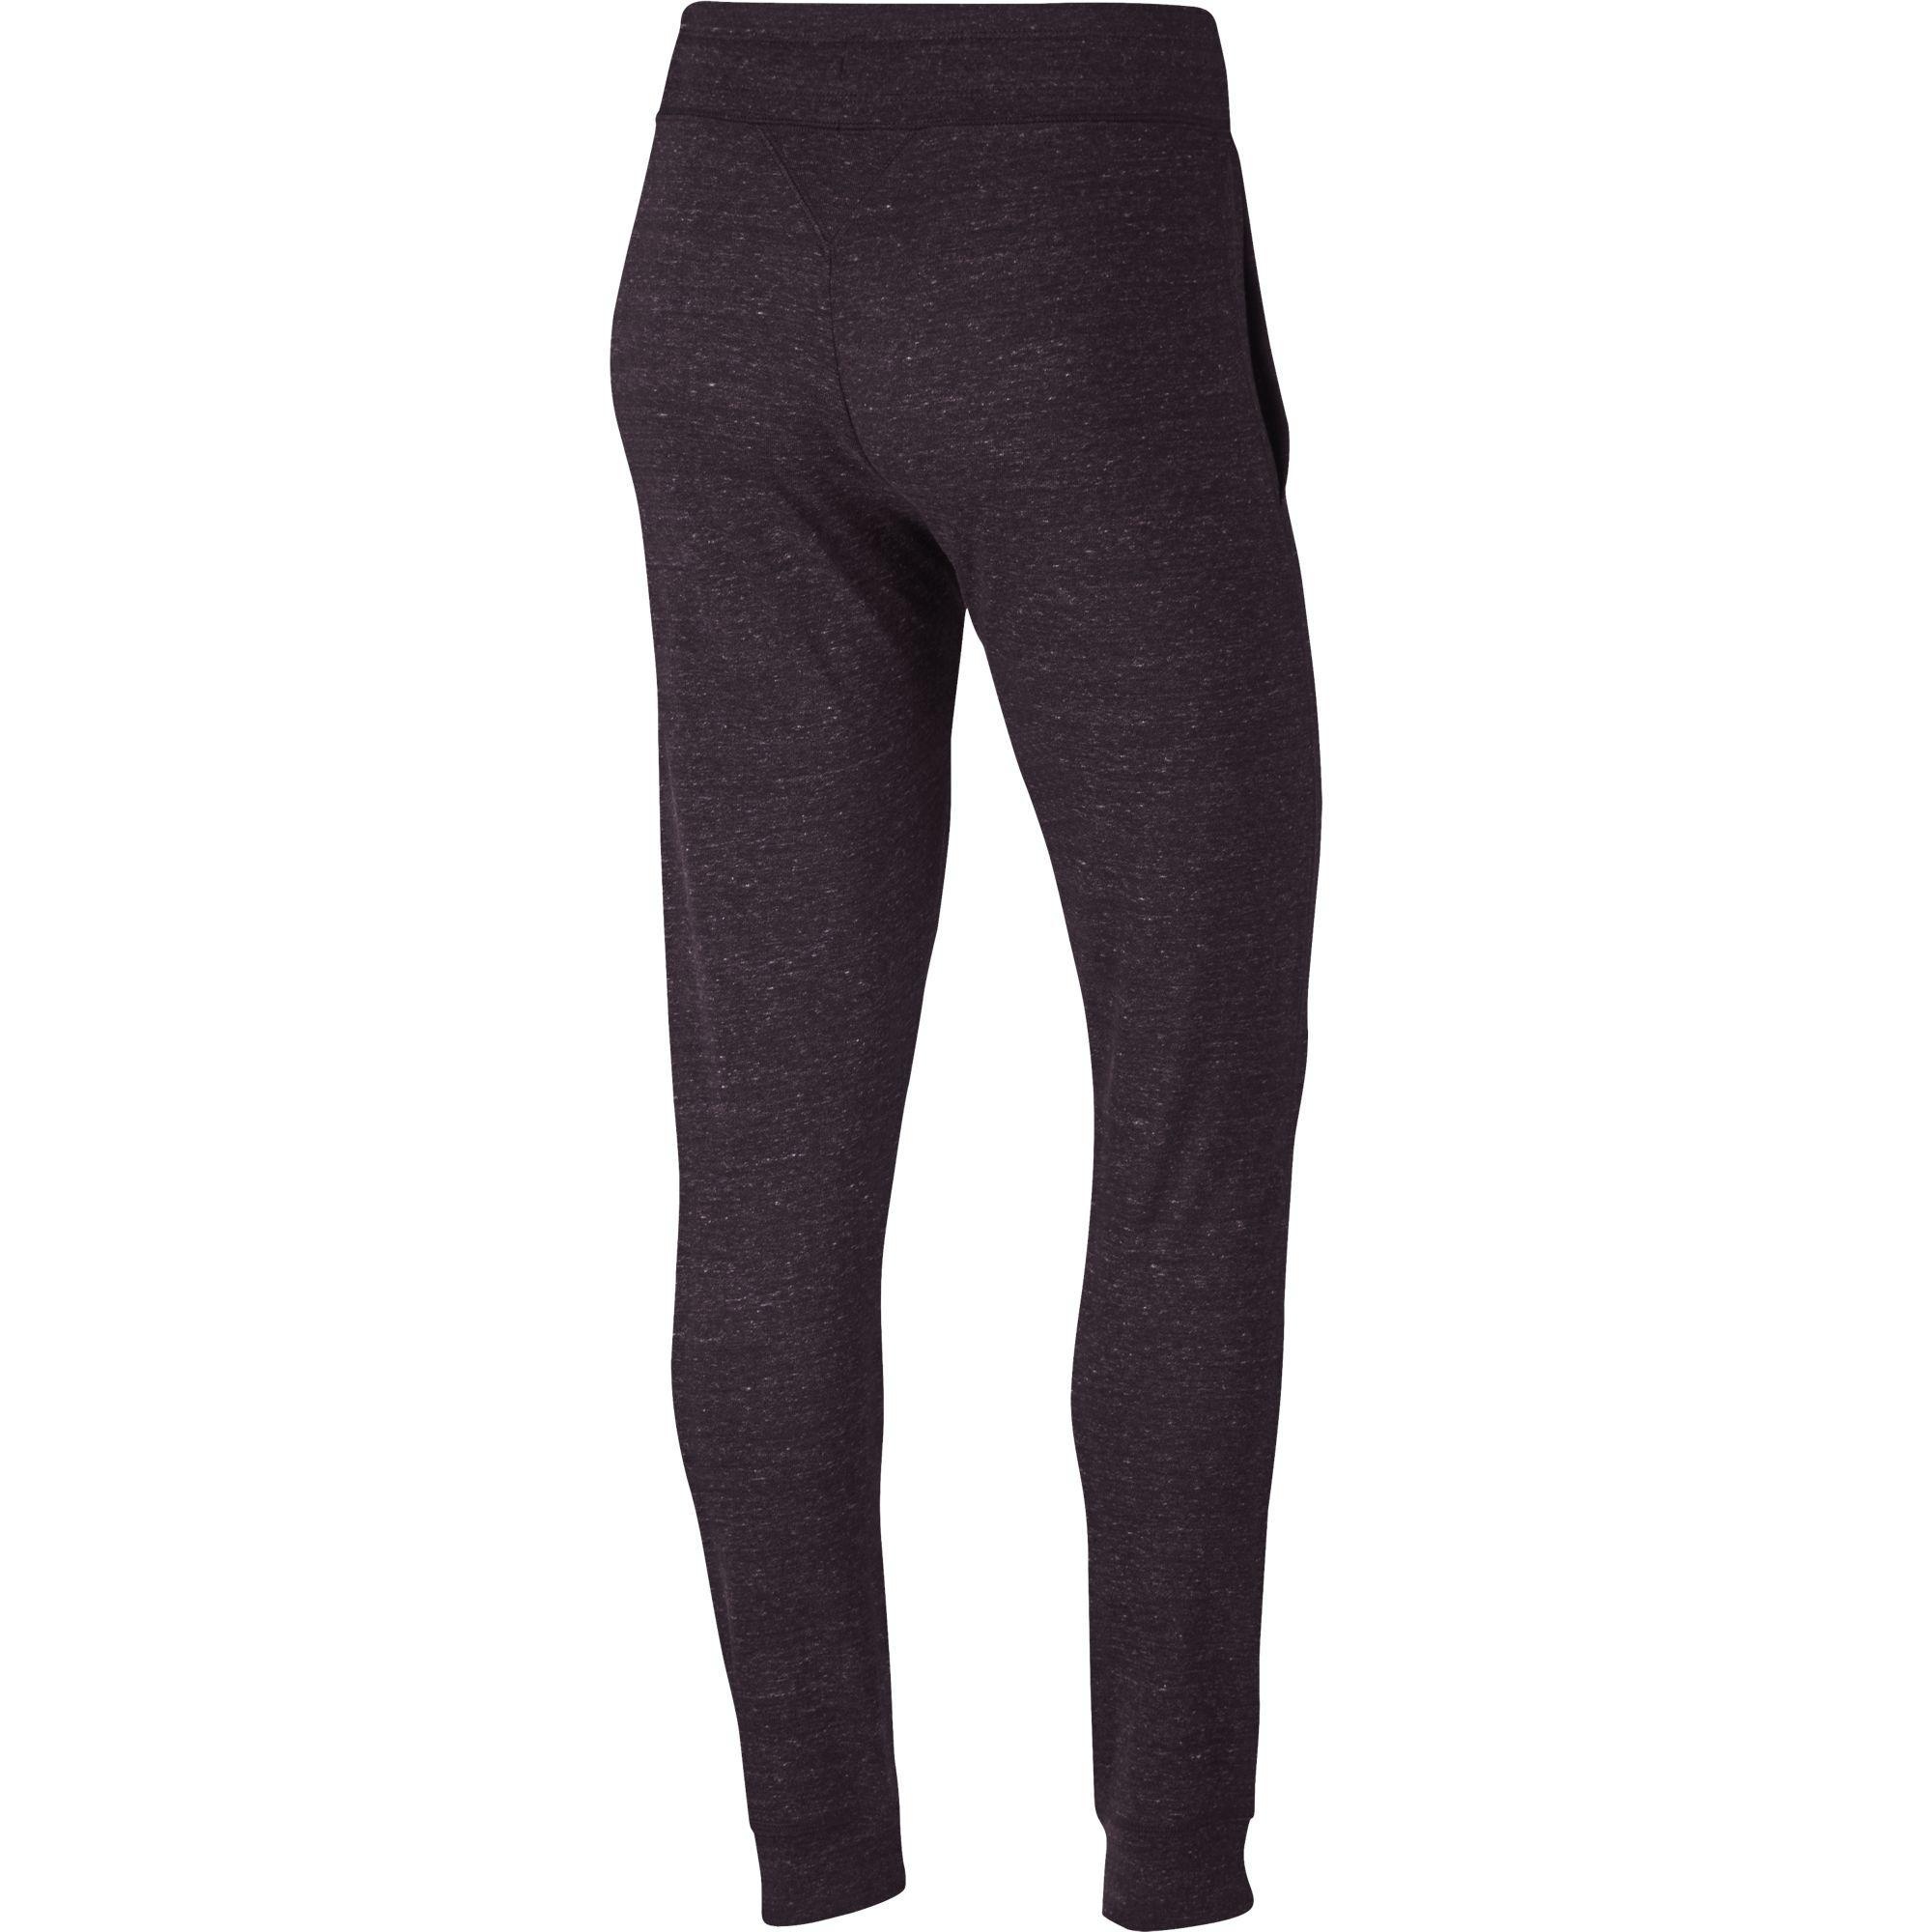 Nike Womens Sportswear Vintage Pants - Portwine Sail - Tennisnuts.com 3eae6c25a9488